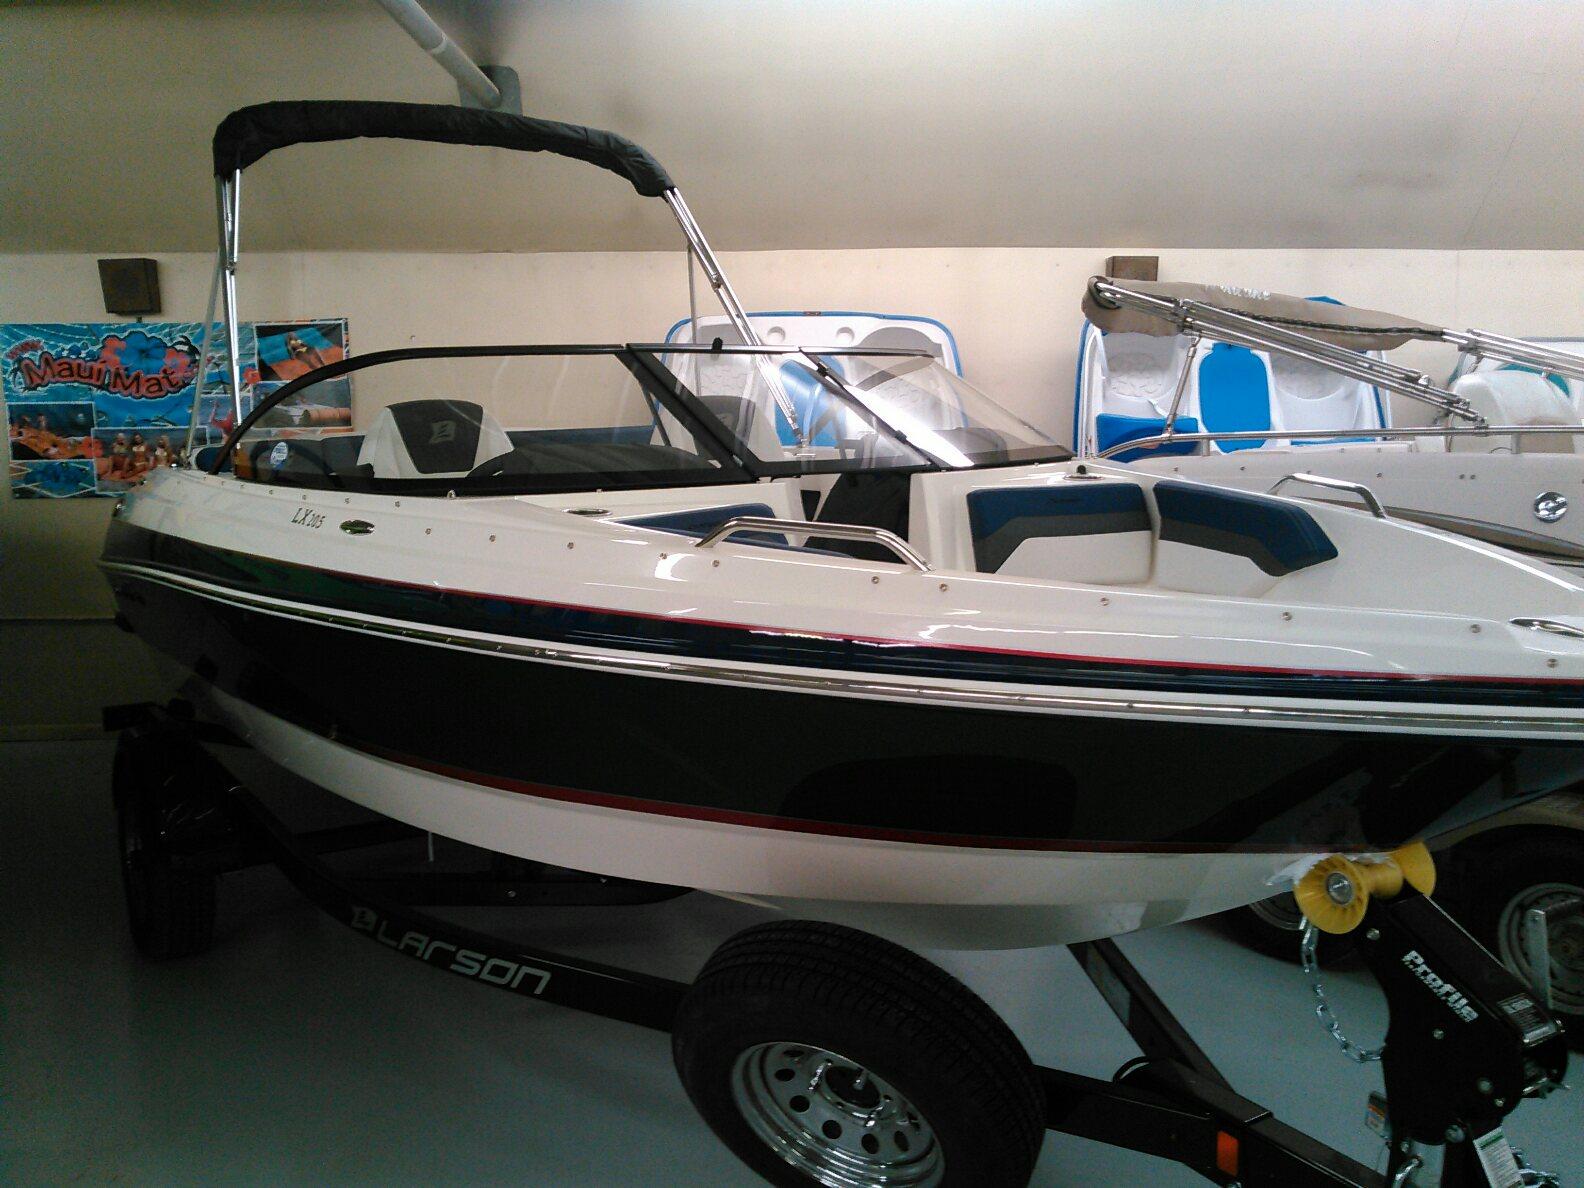 Inventory Link Recreational Minong Wi 715 466 2272 Crestliner Pontoon Boat Wiring Diagram 2019